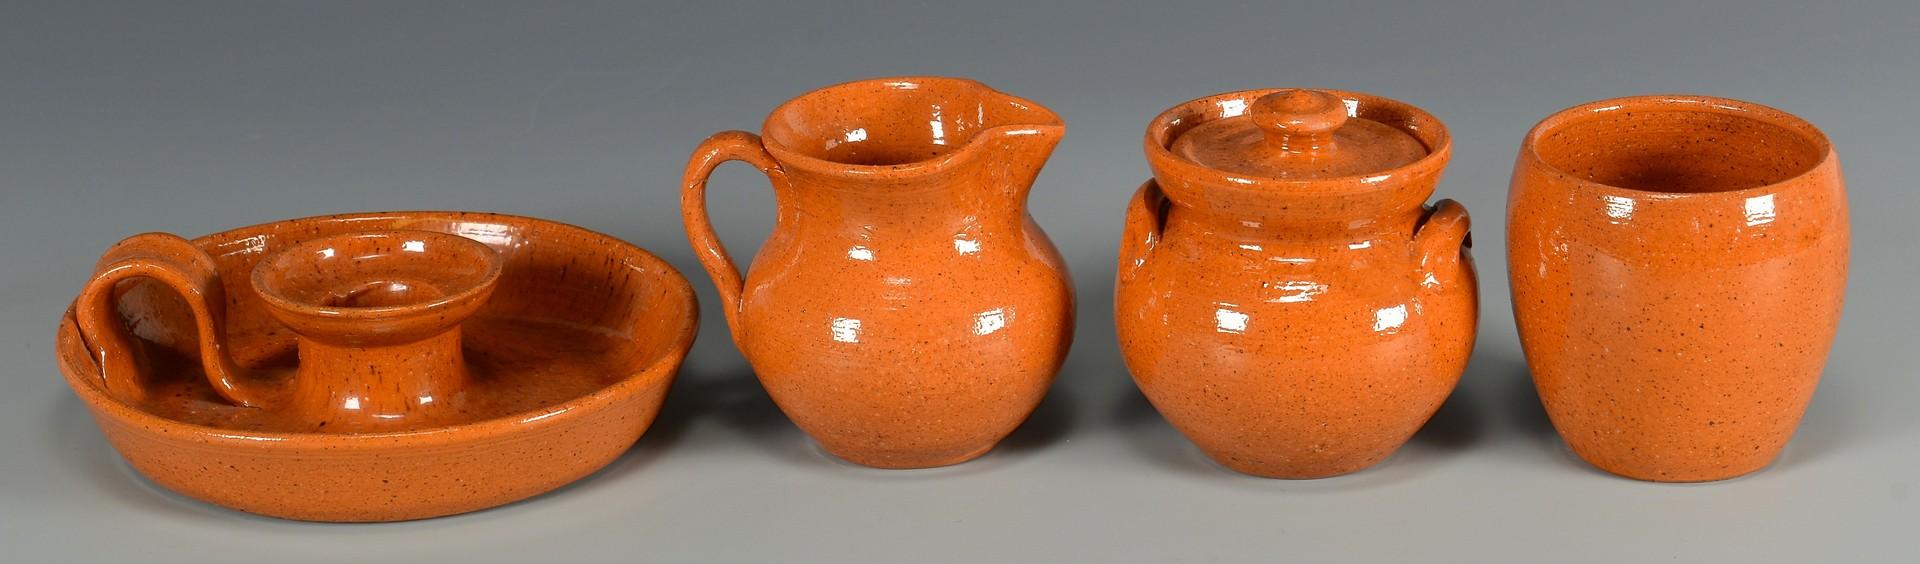 Lot 773: 26 pcs Jugtown Pottery, Vernon Owens